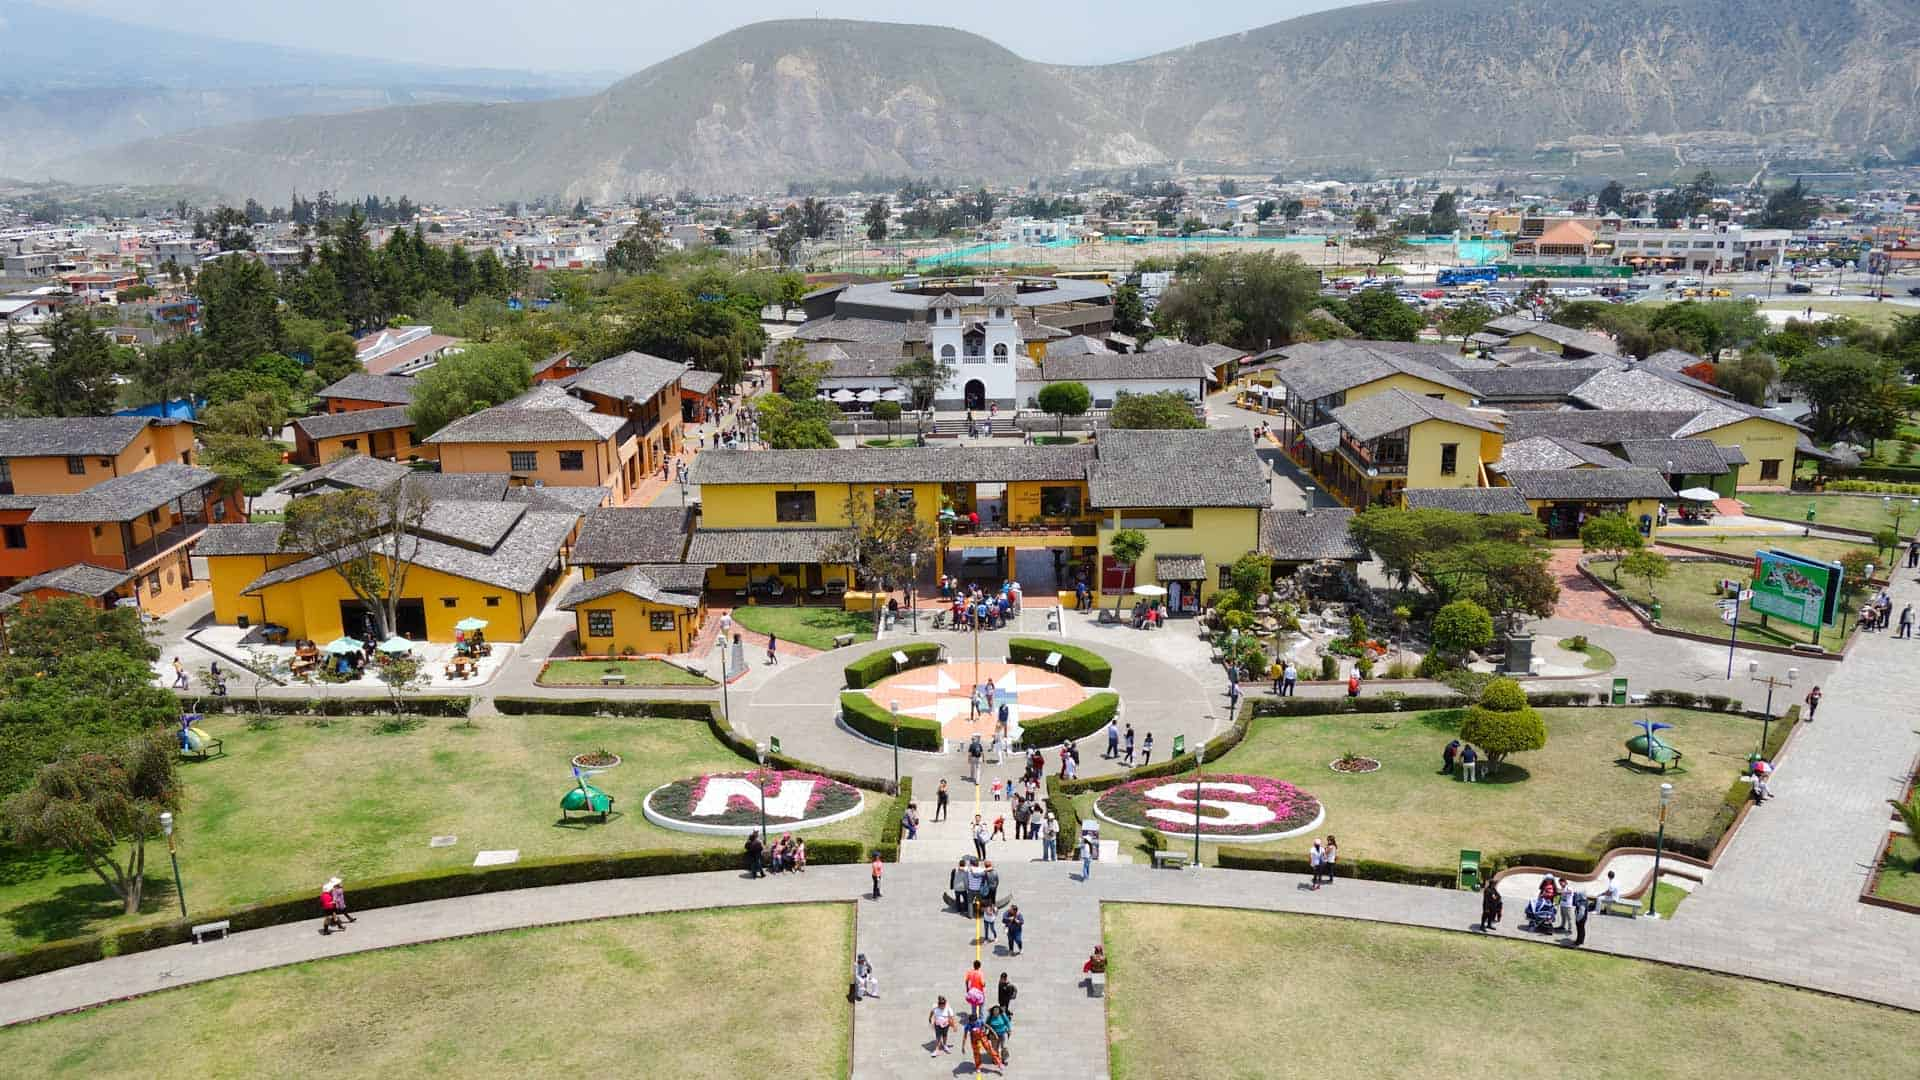 Mitad del Mundo, the Ecuator of the World, in Ecuador